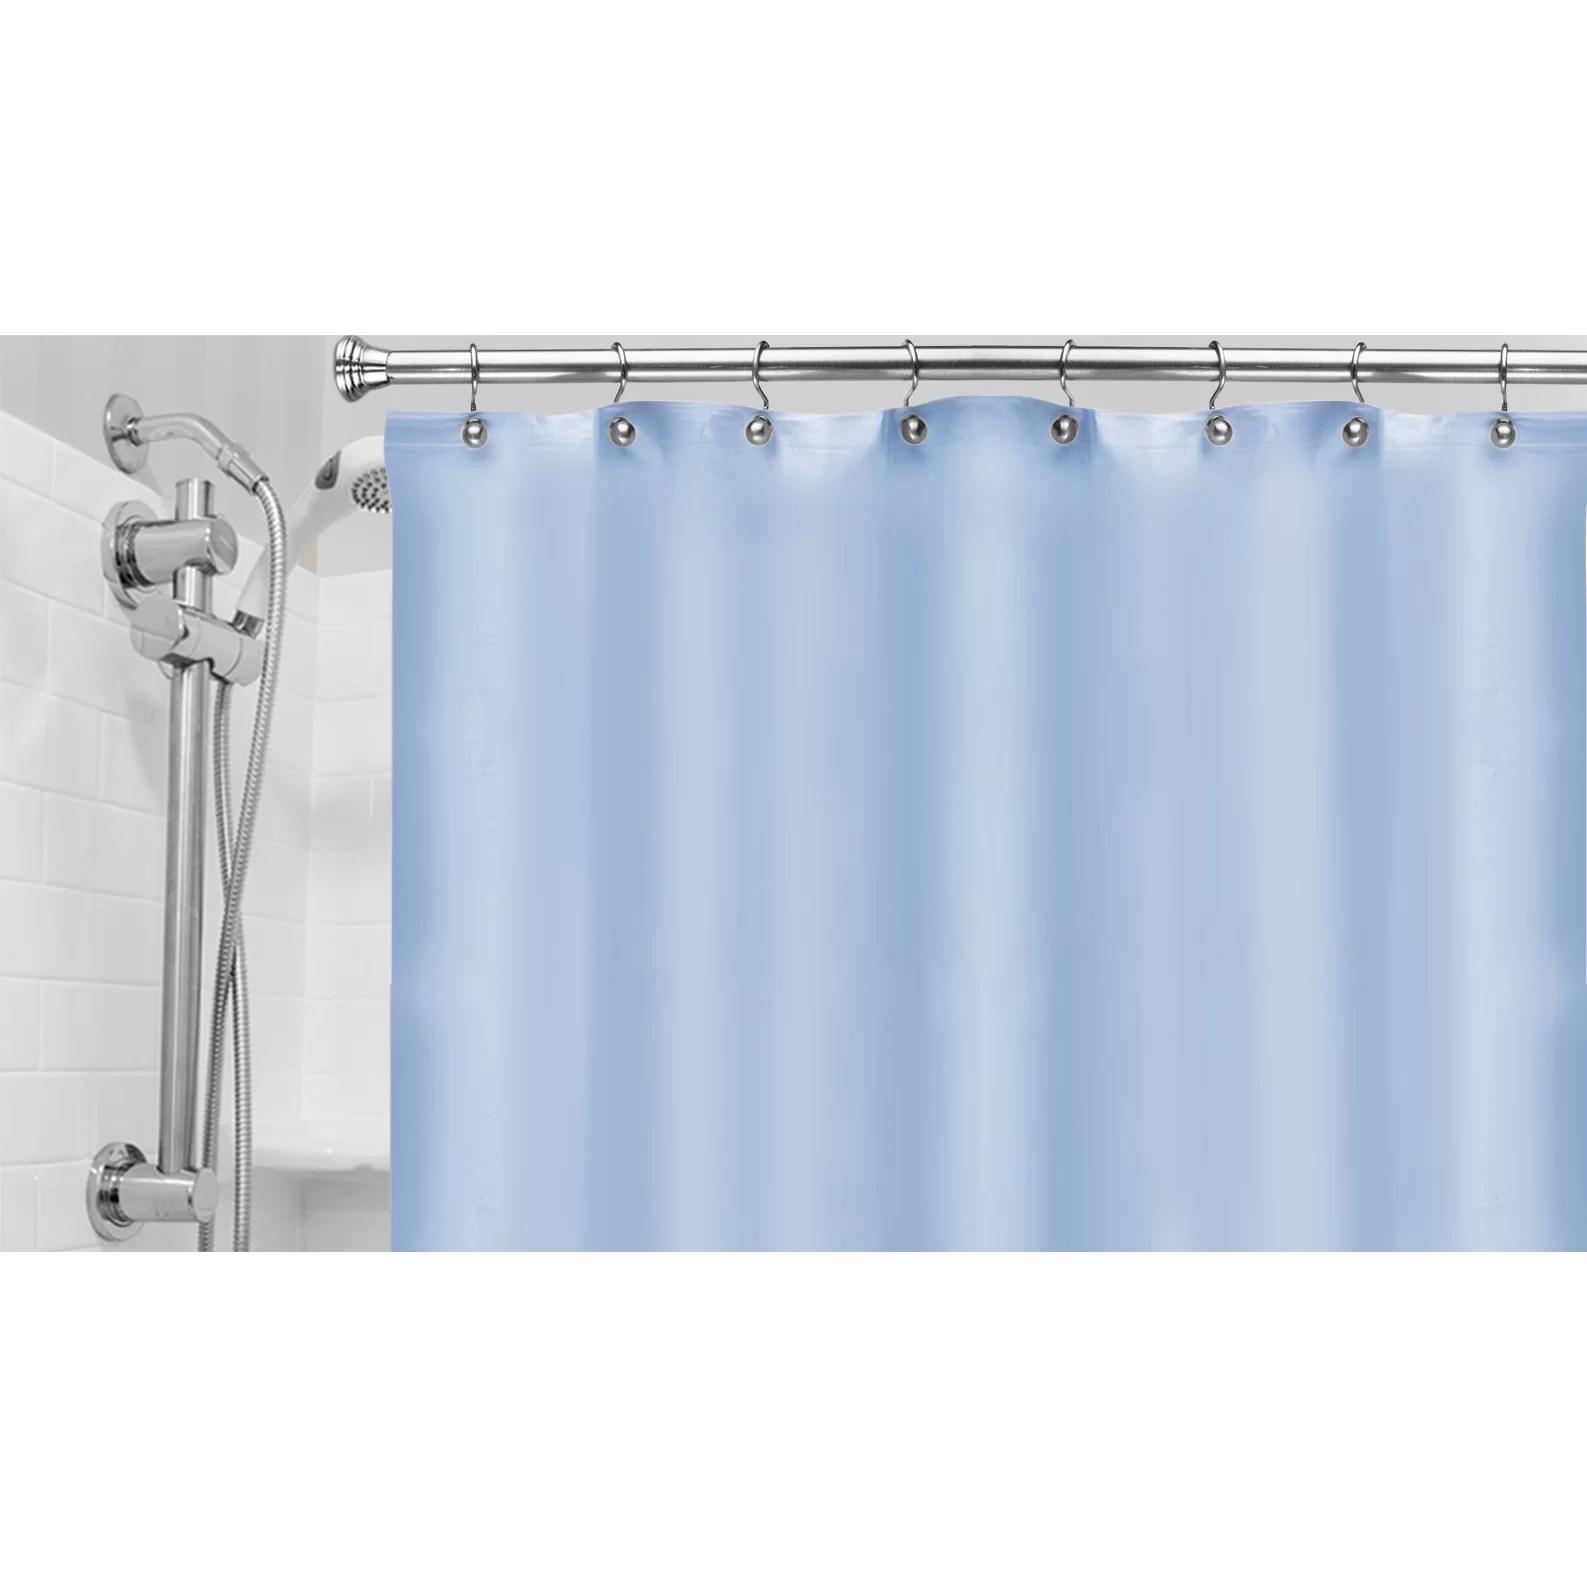 Popular Bath Products Vinyl Hotel Shower Curtain Liner  Reviews  Wayfair